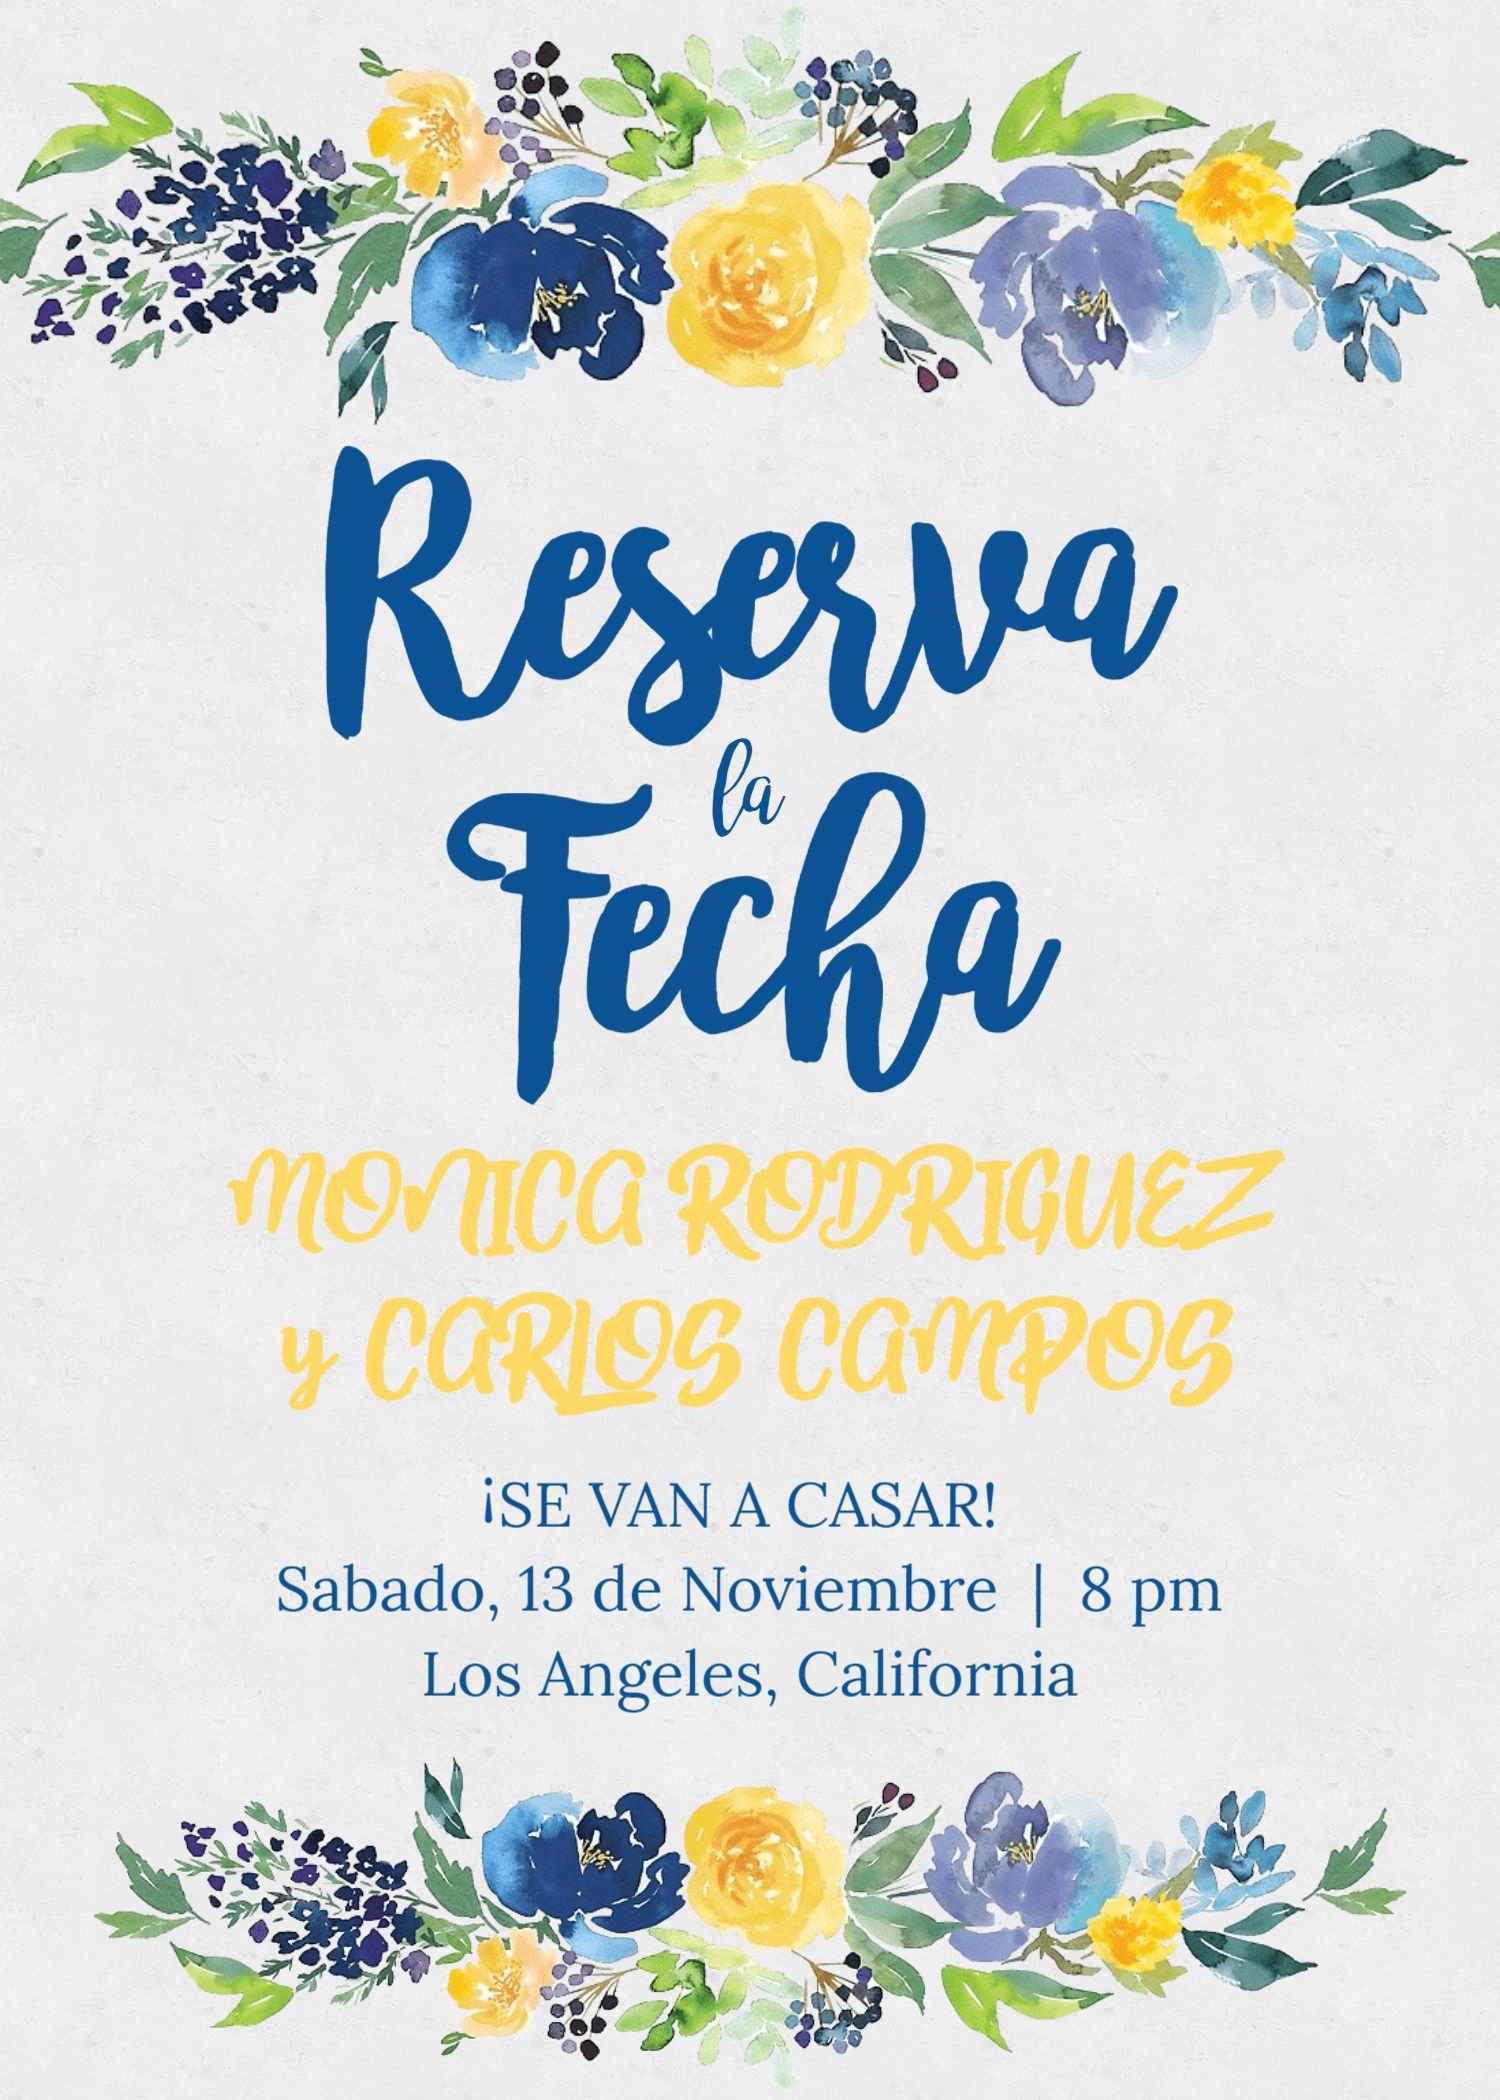 save date reserva la fecha spanish wedding espa u00f1ol